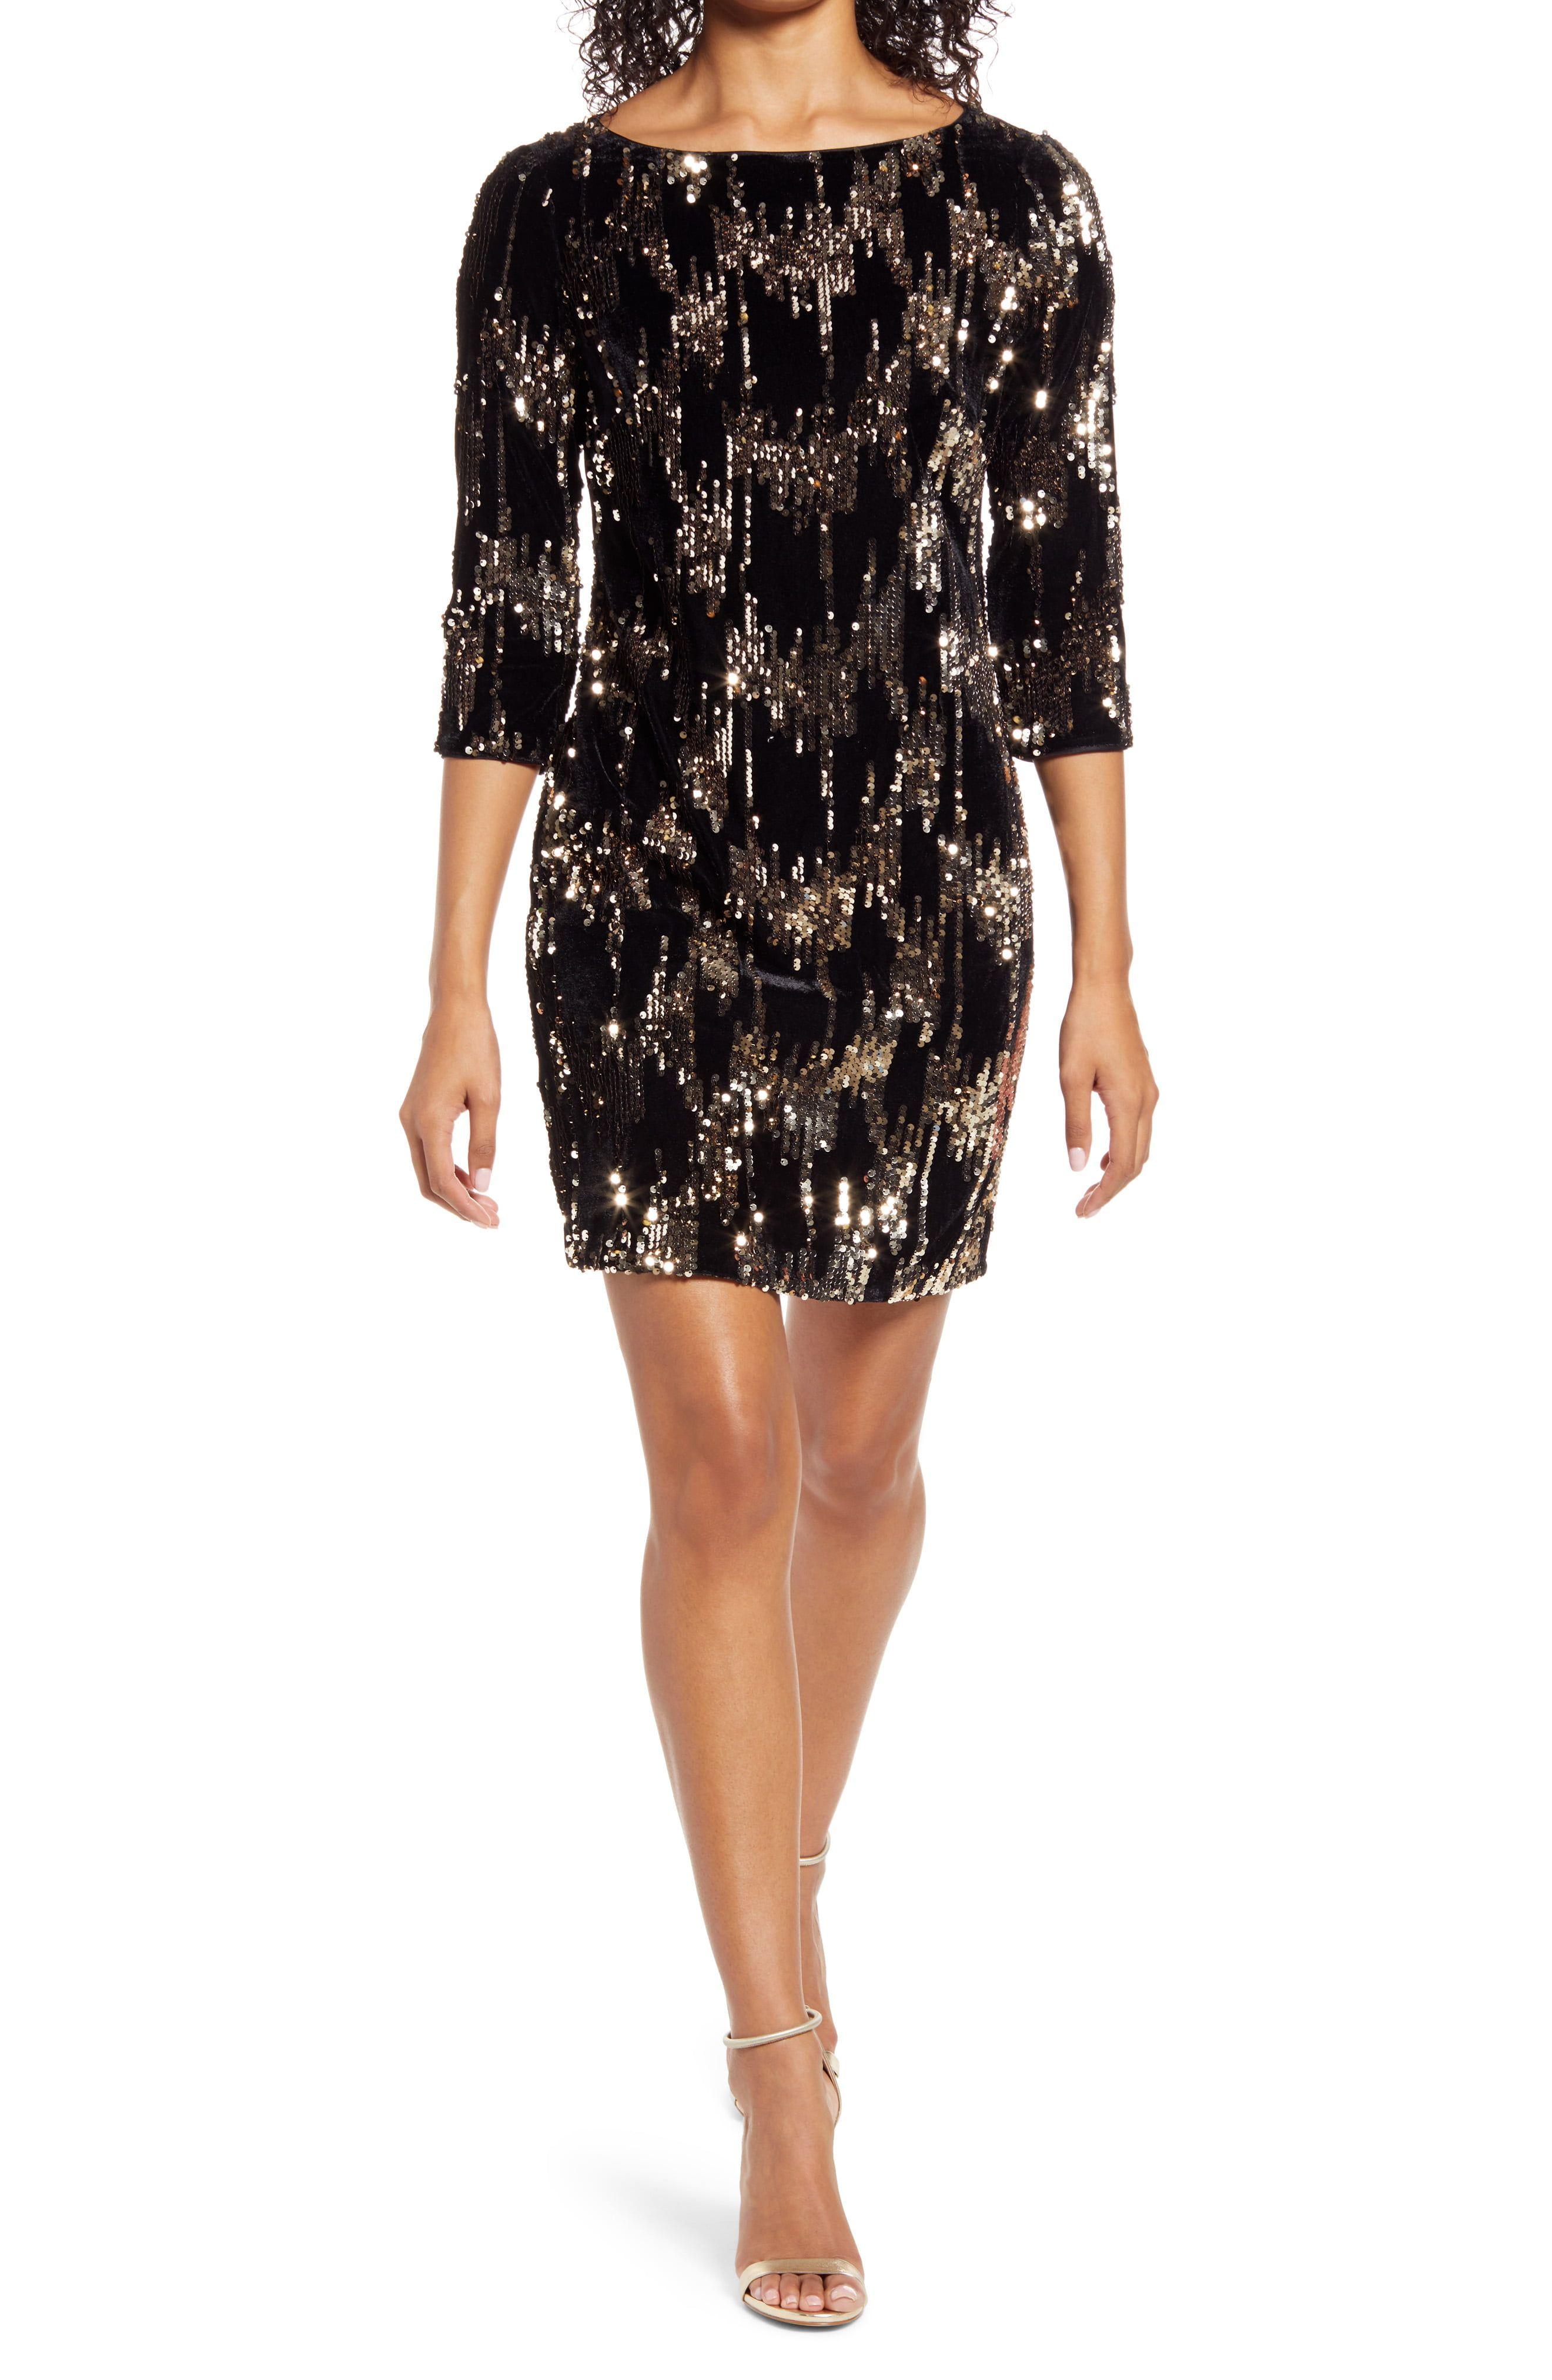 Eliza J Sequin Velvet Shift Dress Nordstrom In 2021 Velvet Shift Dress Shift Dress Nordstrom Dresses [ 4048 x 2640 Pixel ]